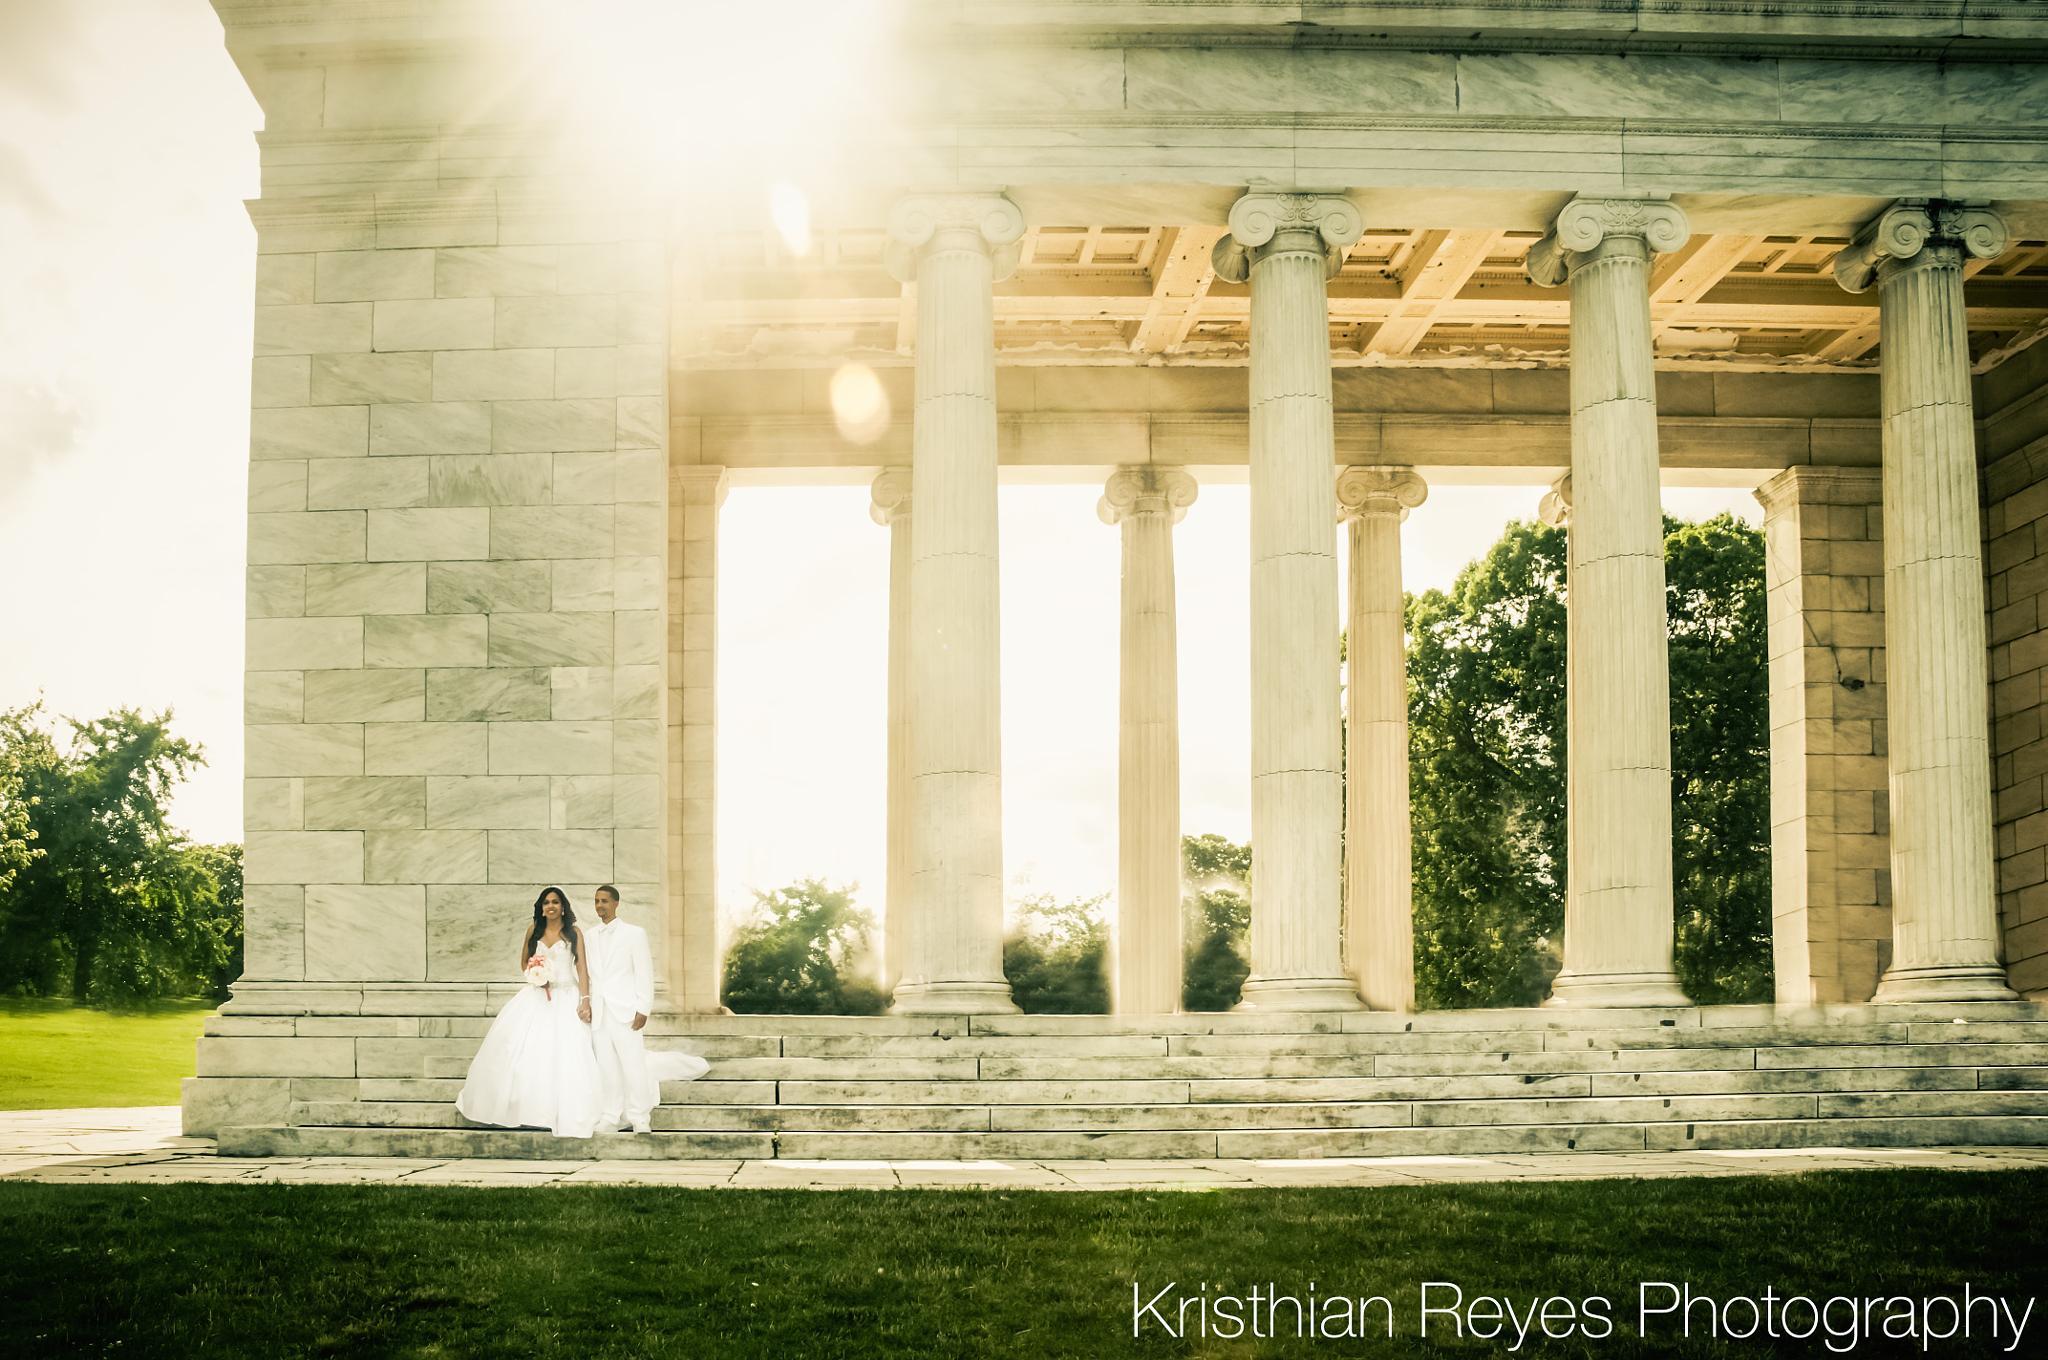 Wedding Photo by krissrey